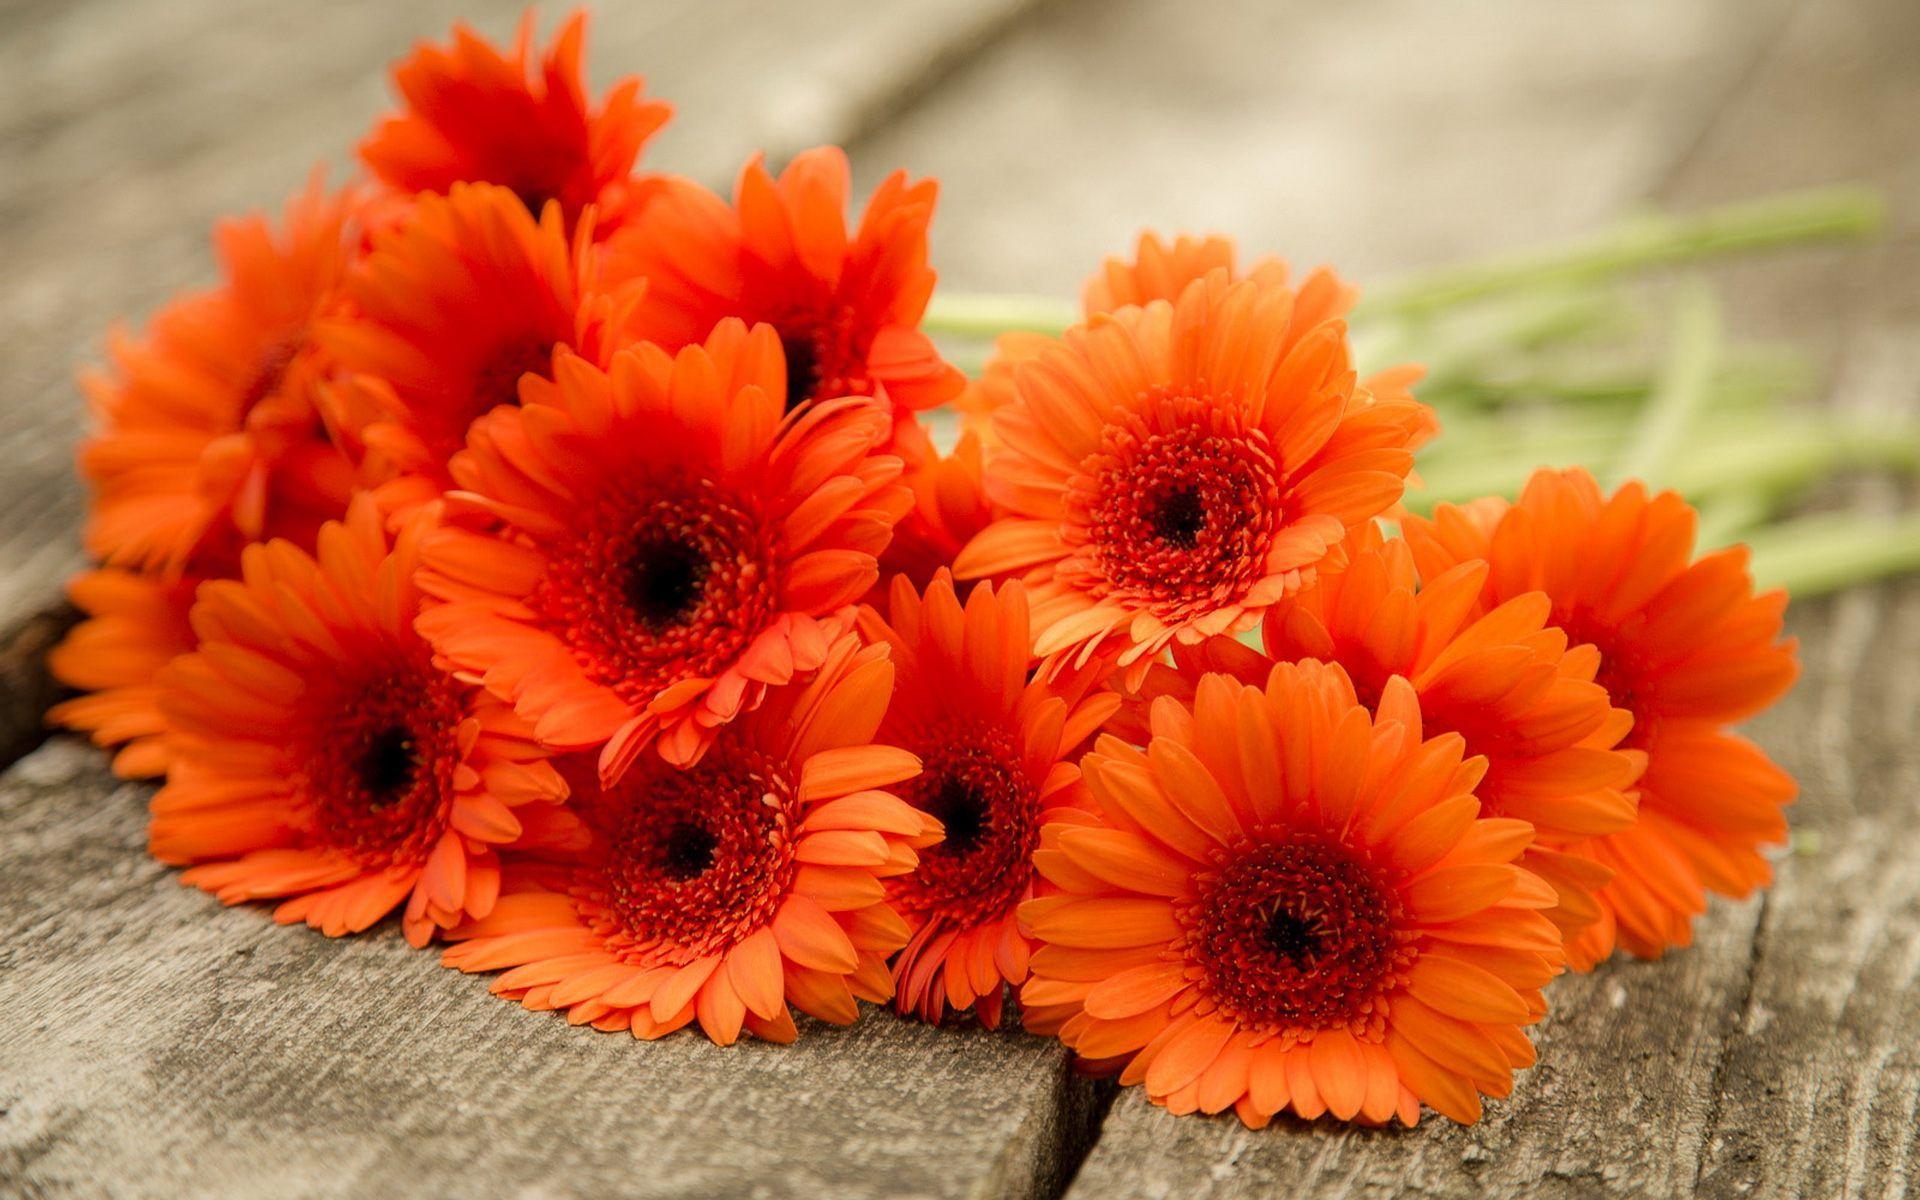 Gerbera Daisies Wallpaper Hd For Desktop Of Orange Flowers Daisy Wallpaper Gerbera Flower Gerbera Daisy